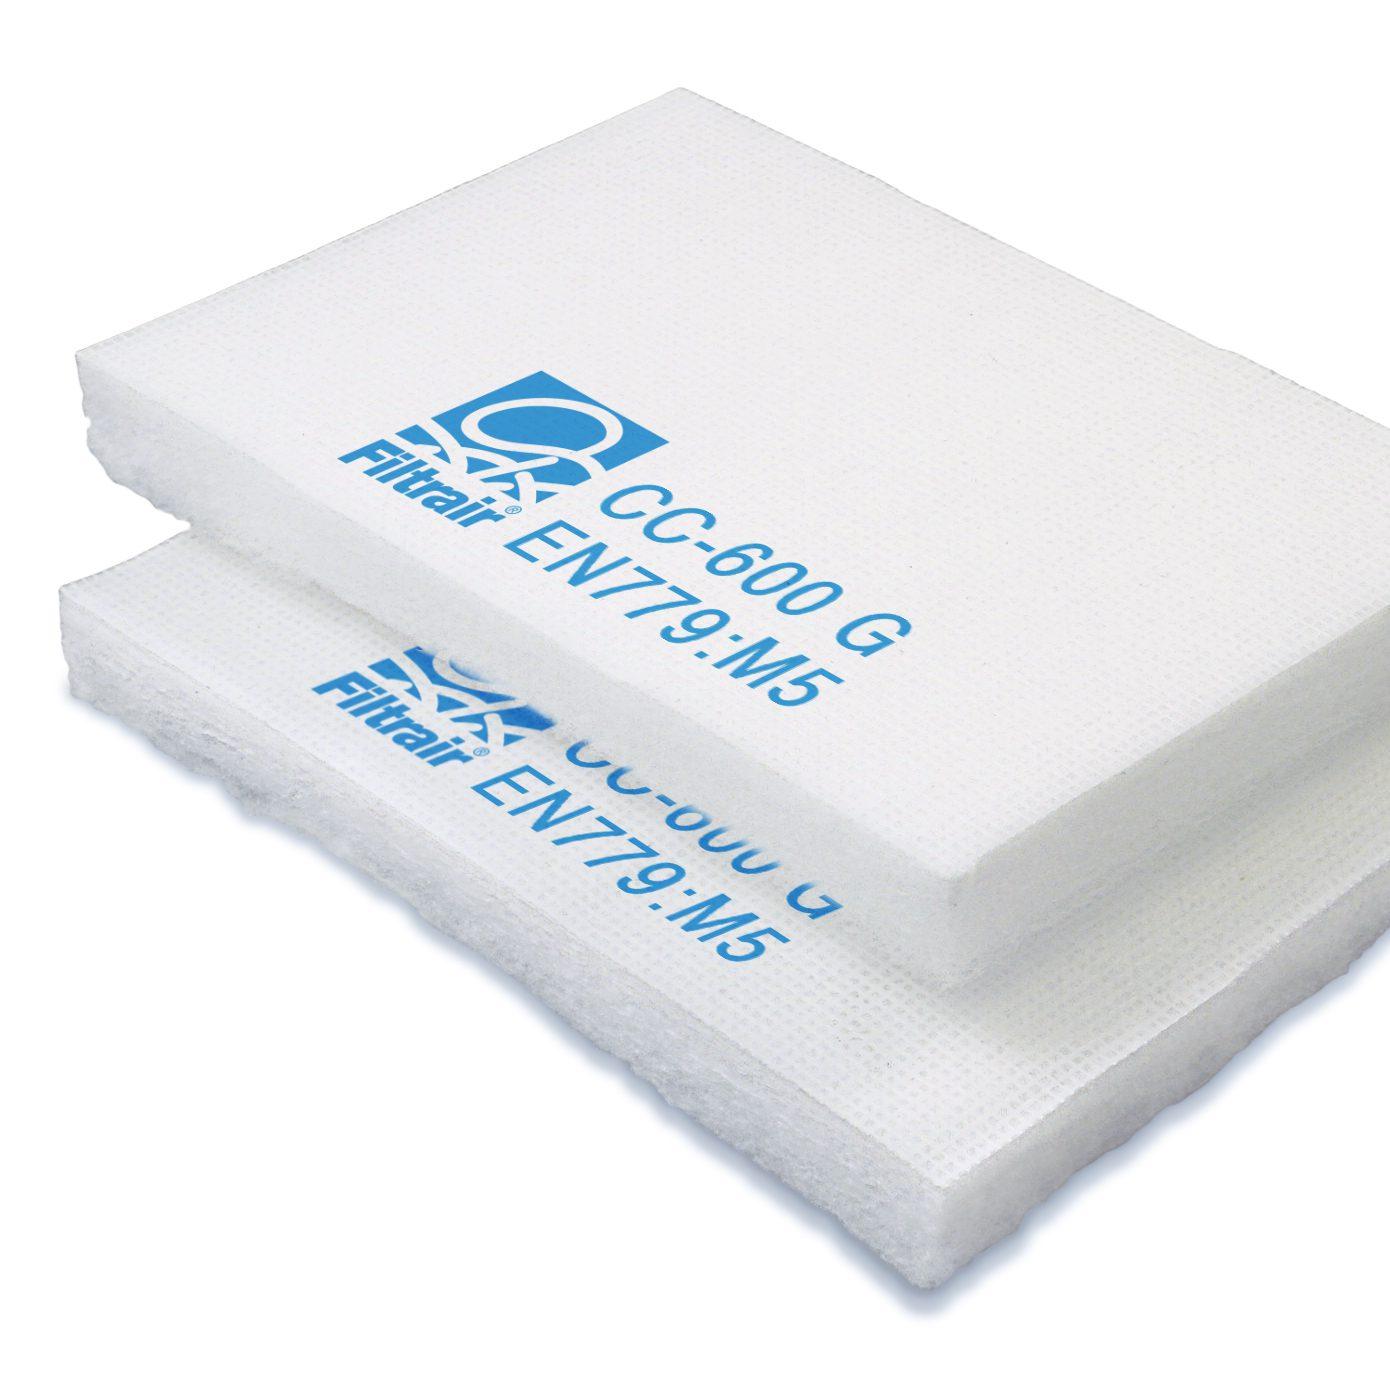 Zuluft Deckenfilter Feinstfiltermatte